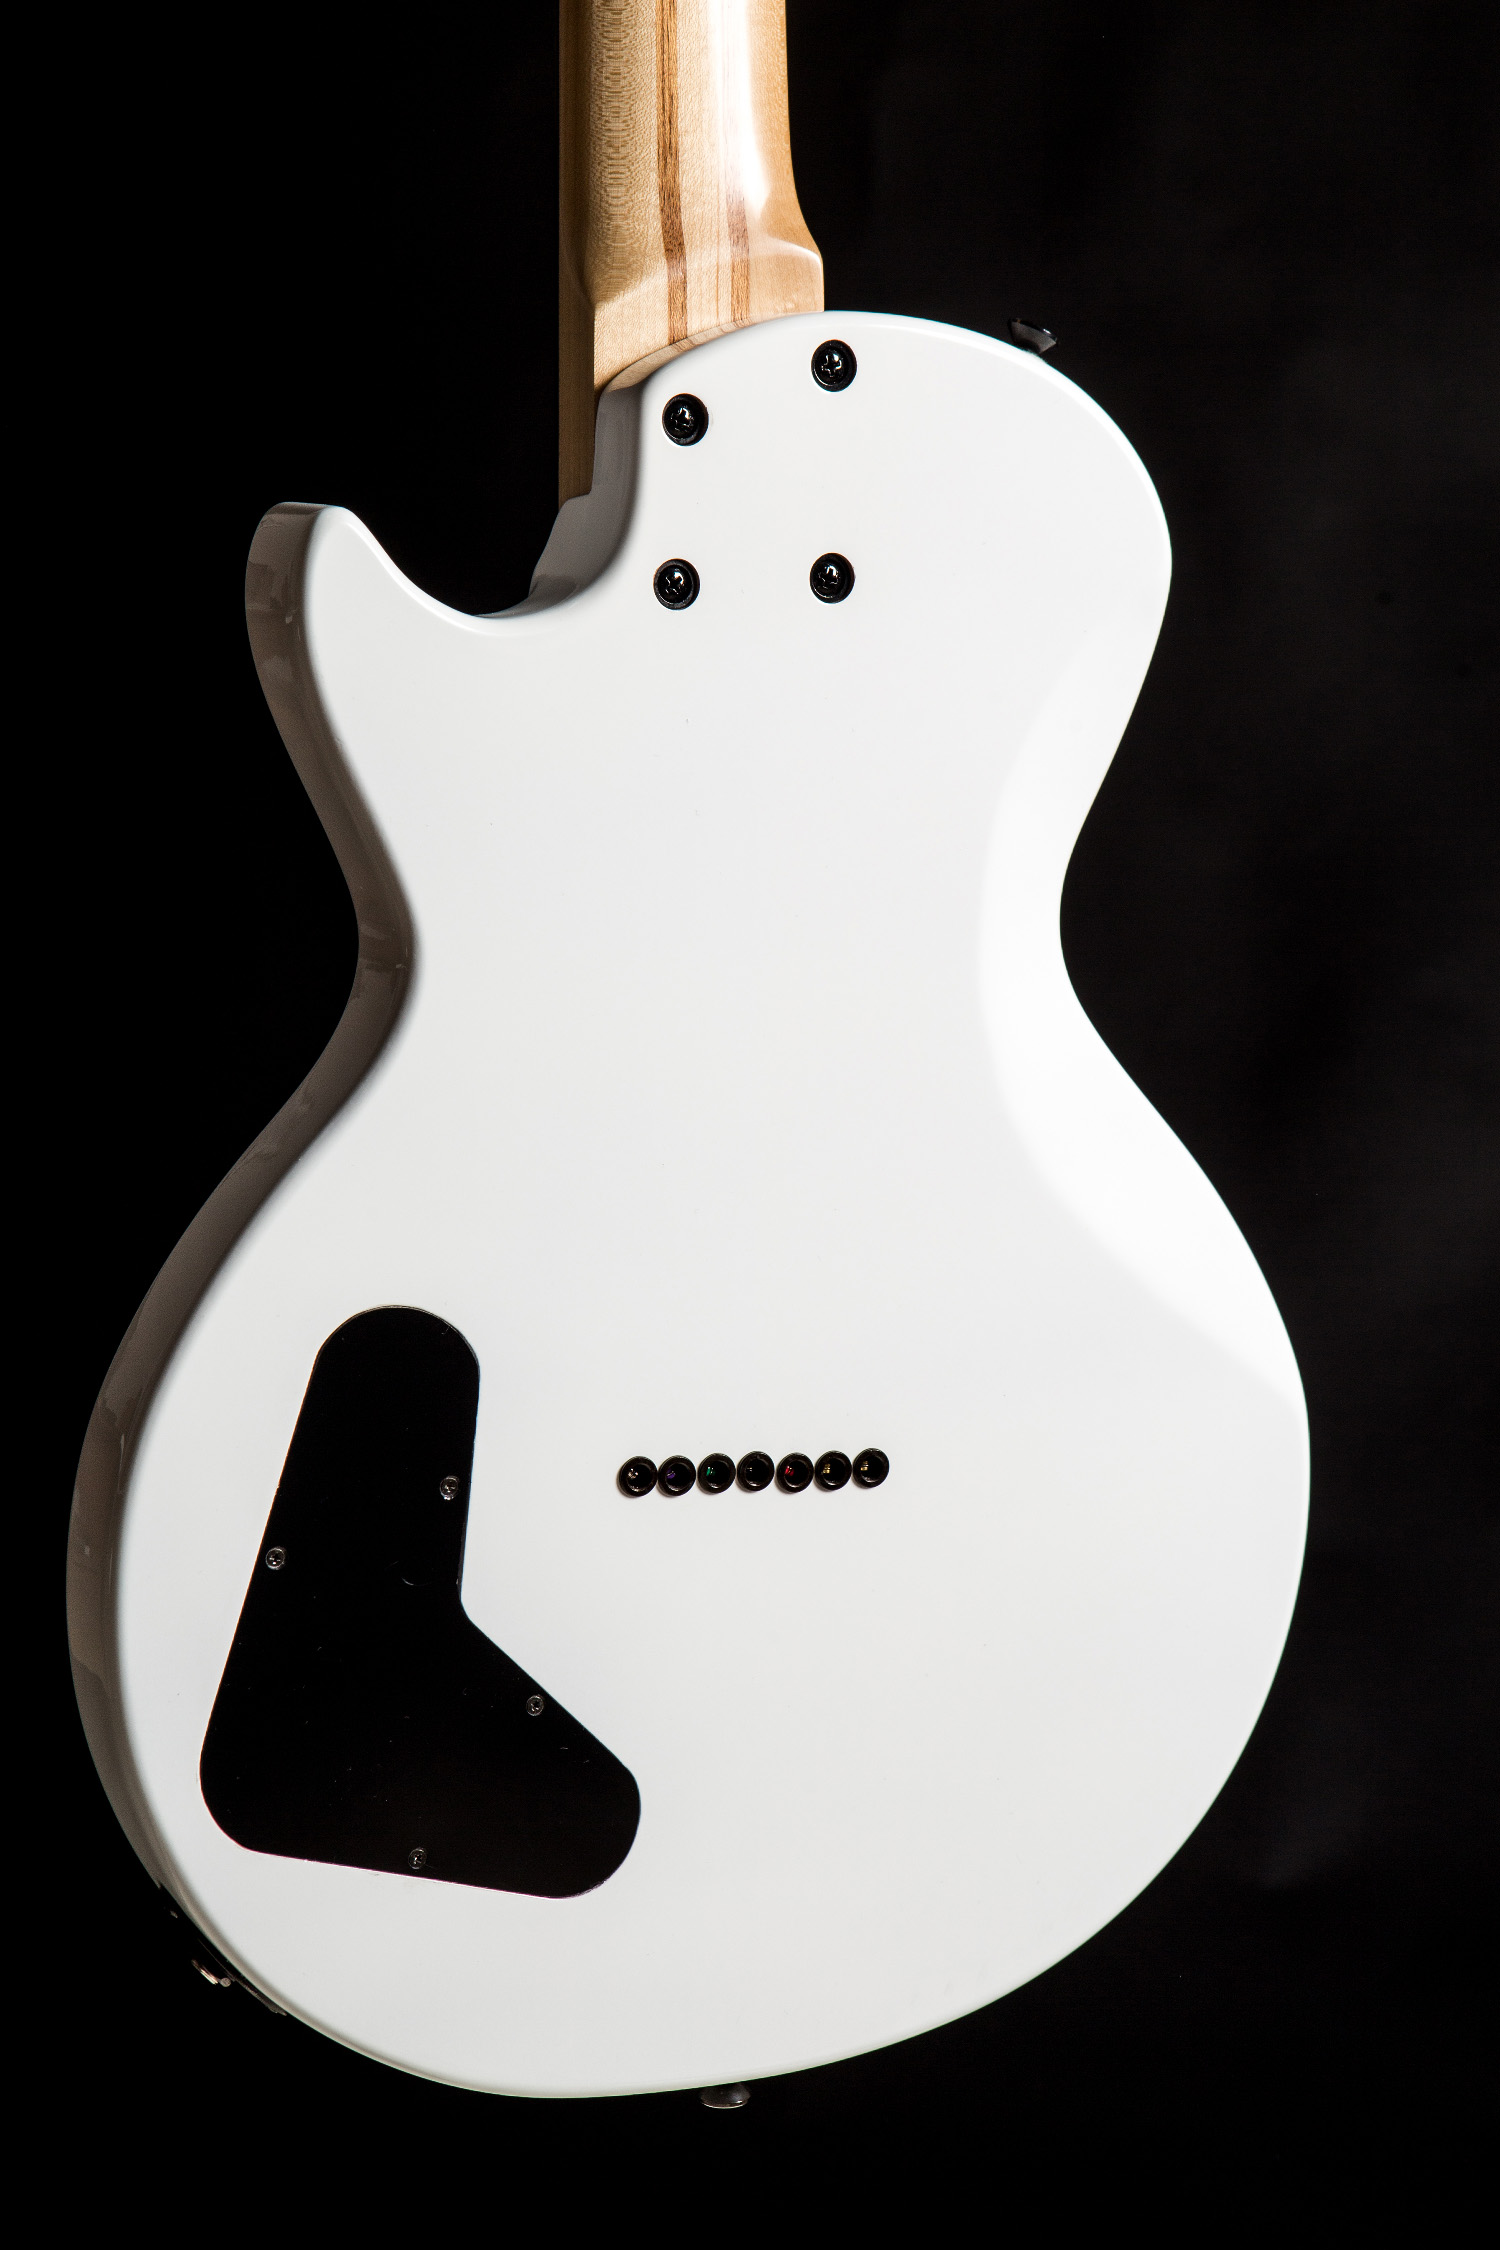 Chitarra WhiteCapurso Guitars foto credits © Giuseppe Di Viesto